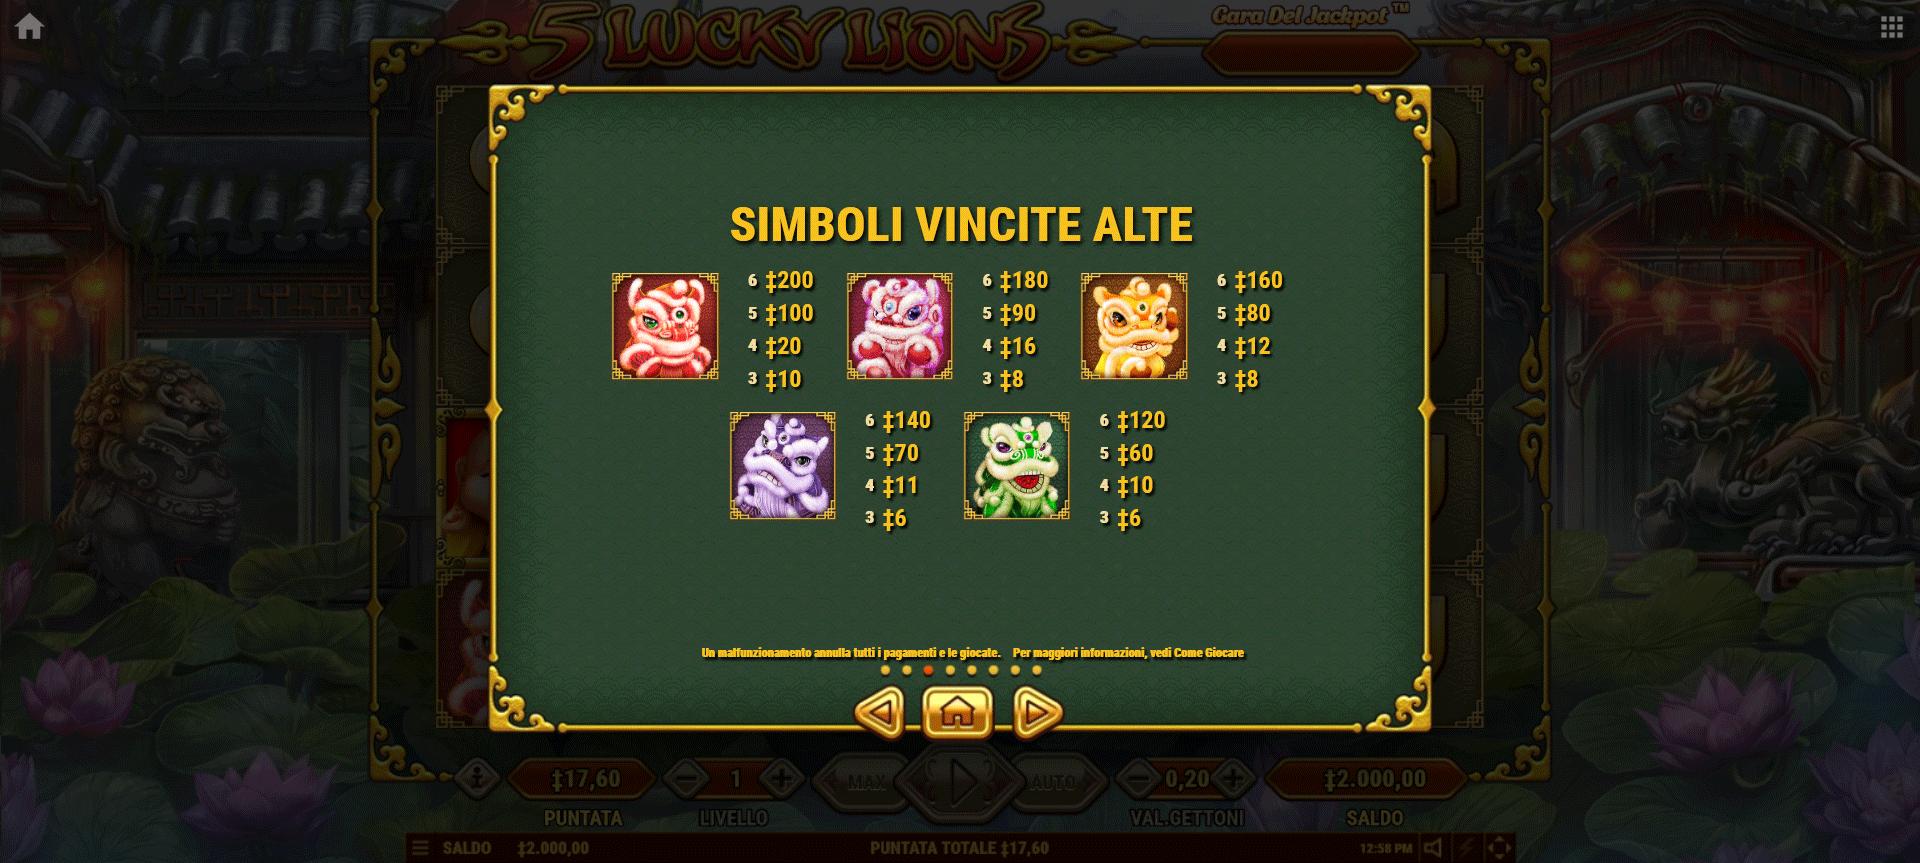 paytable dei simboli della slot online 5 lucky lions